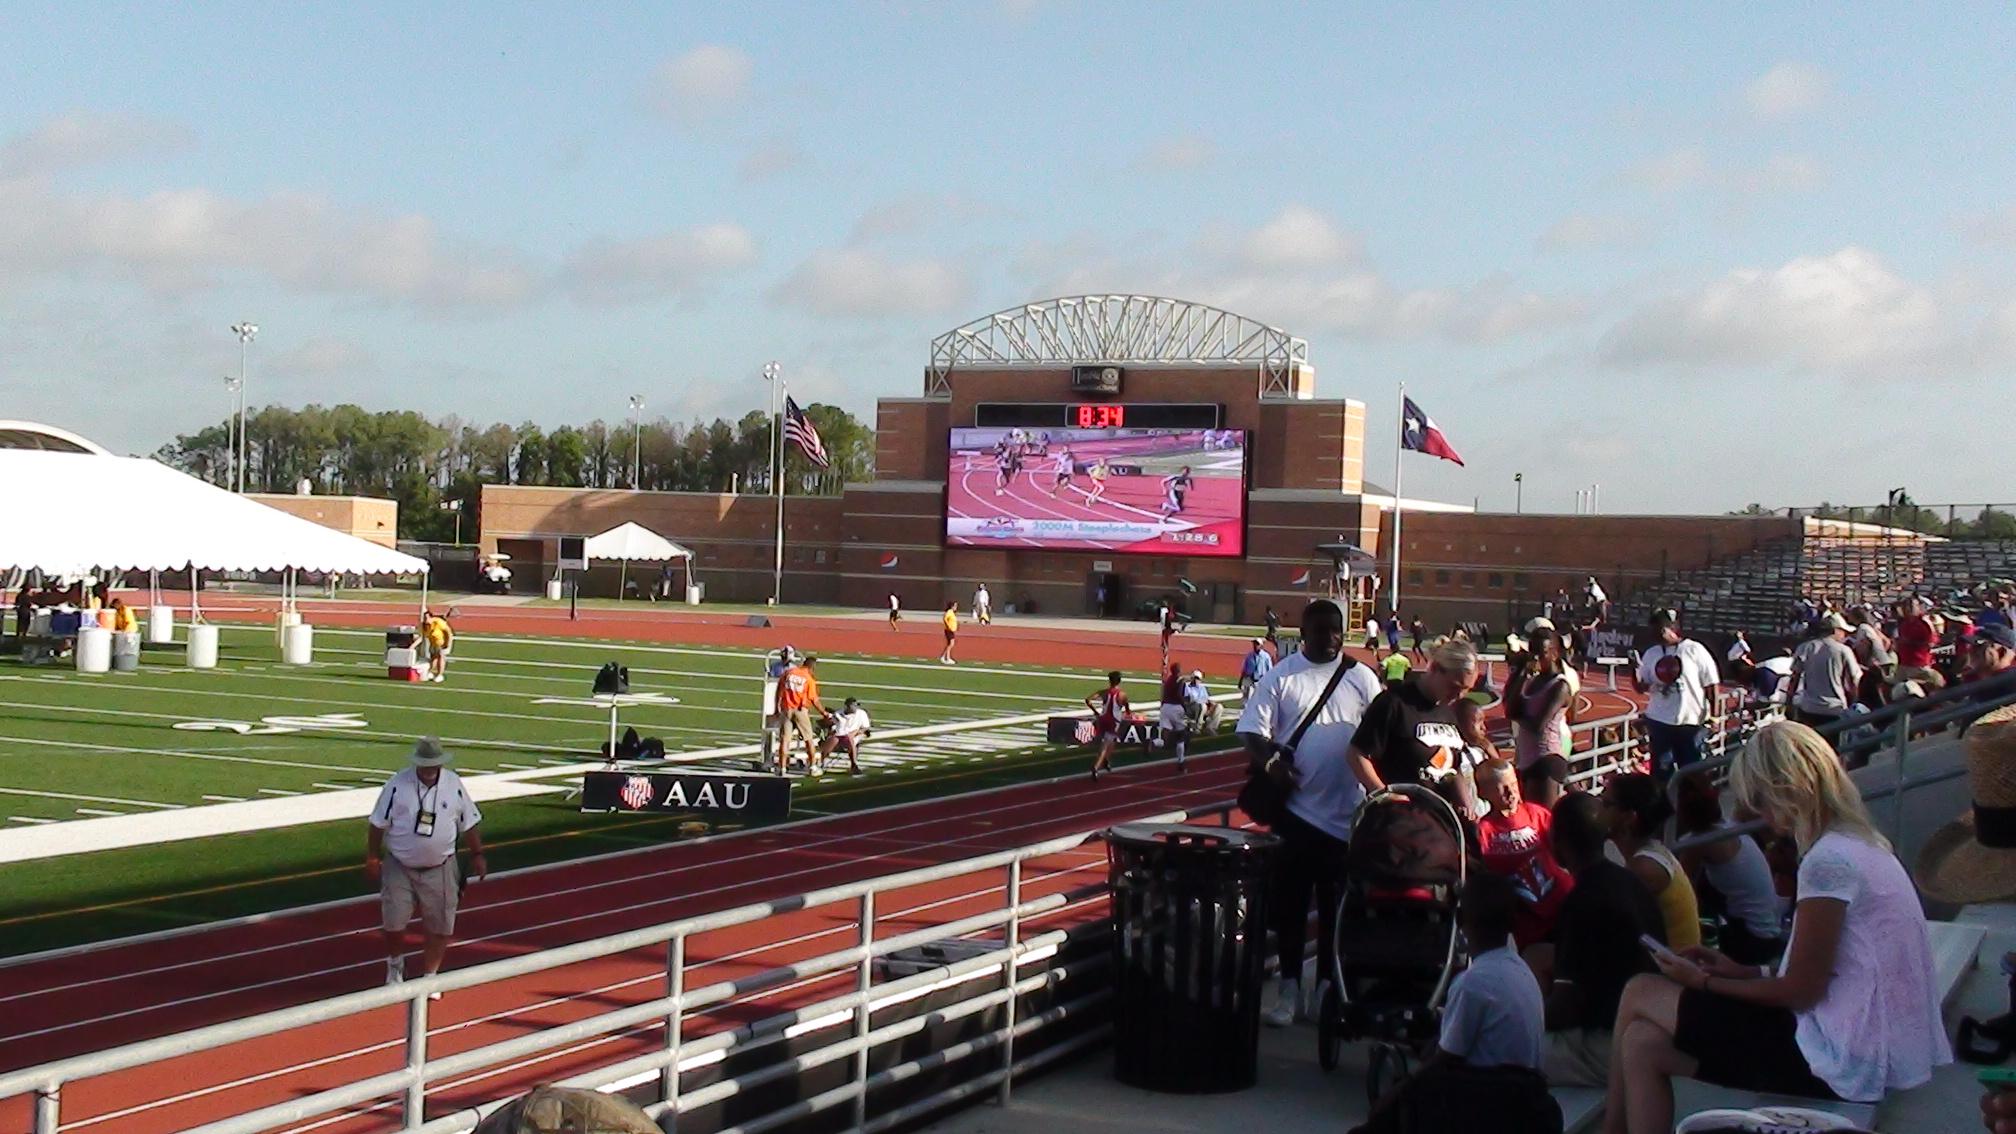 Jumbotron at the north side of Turner Stadium